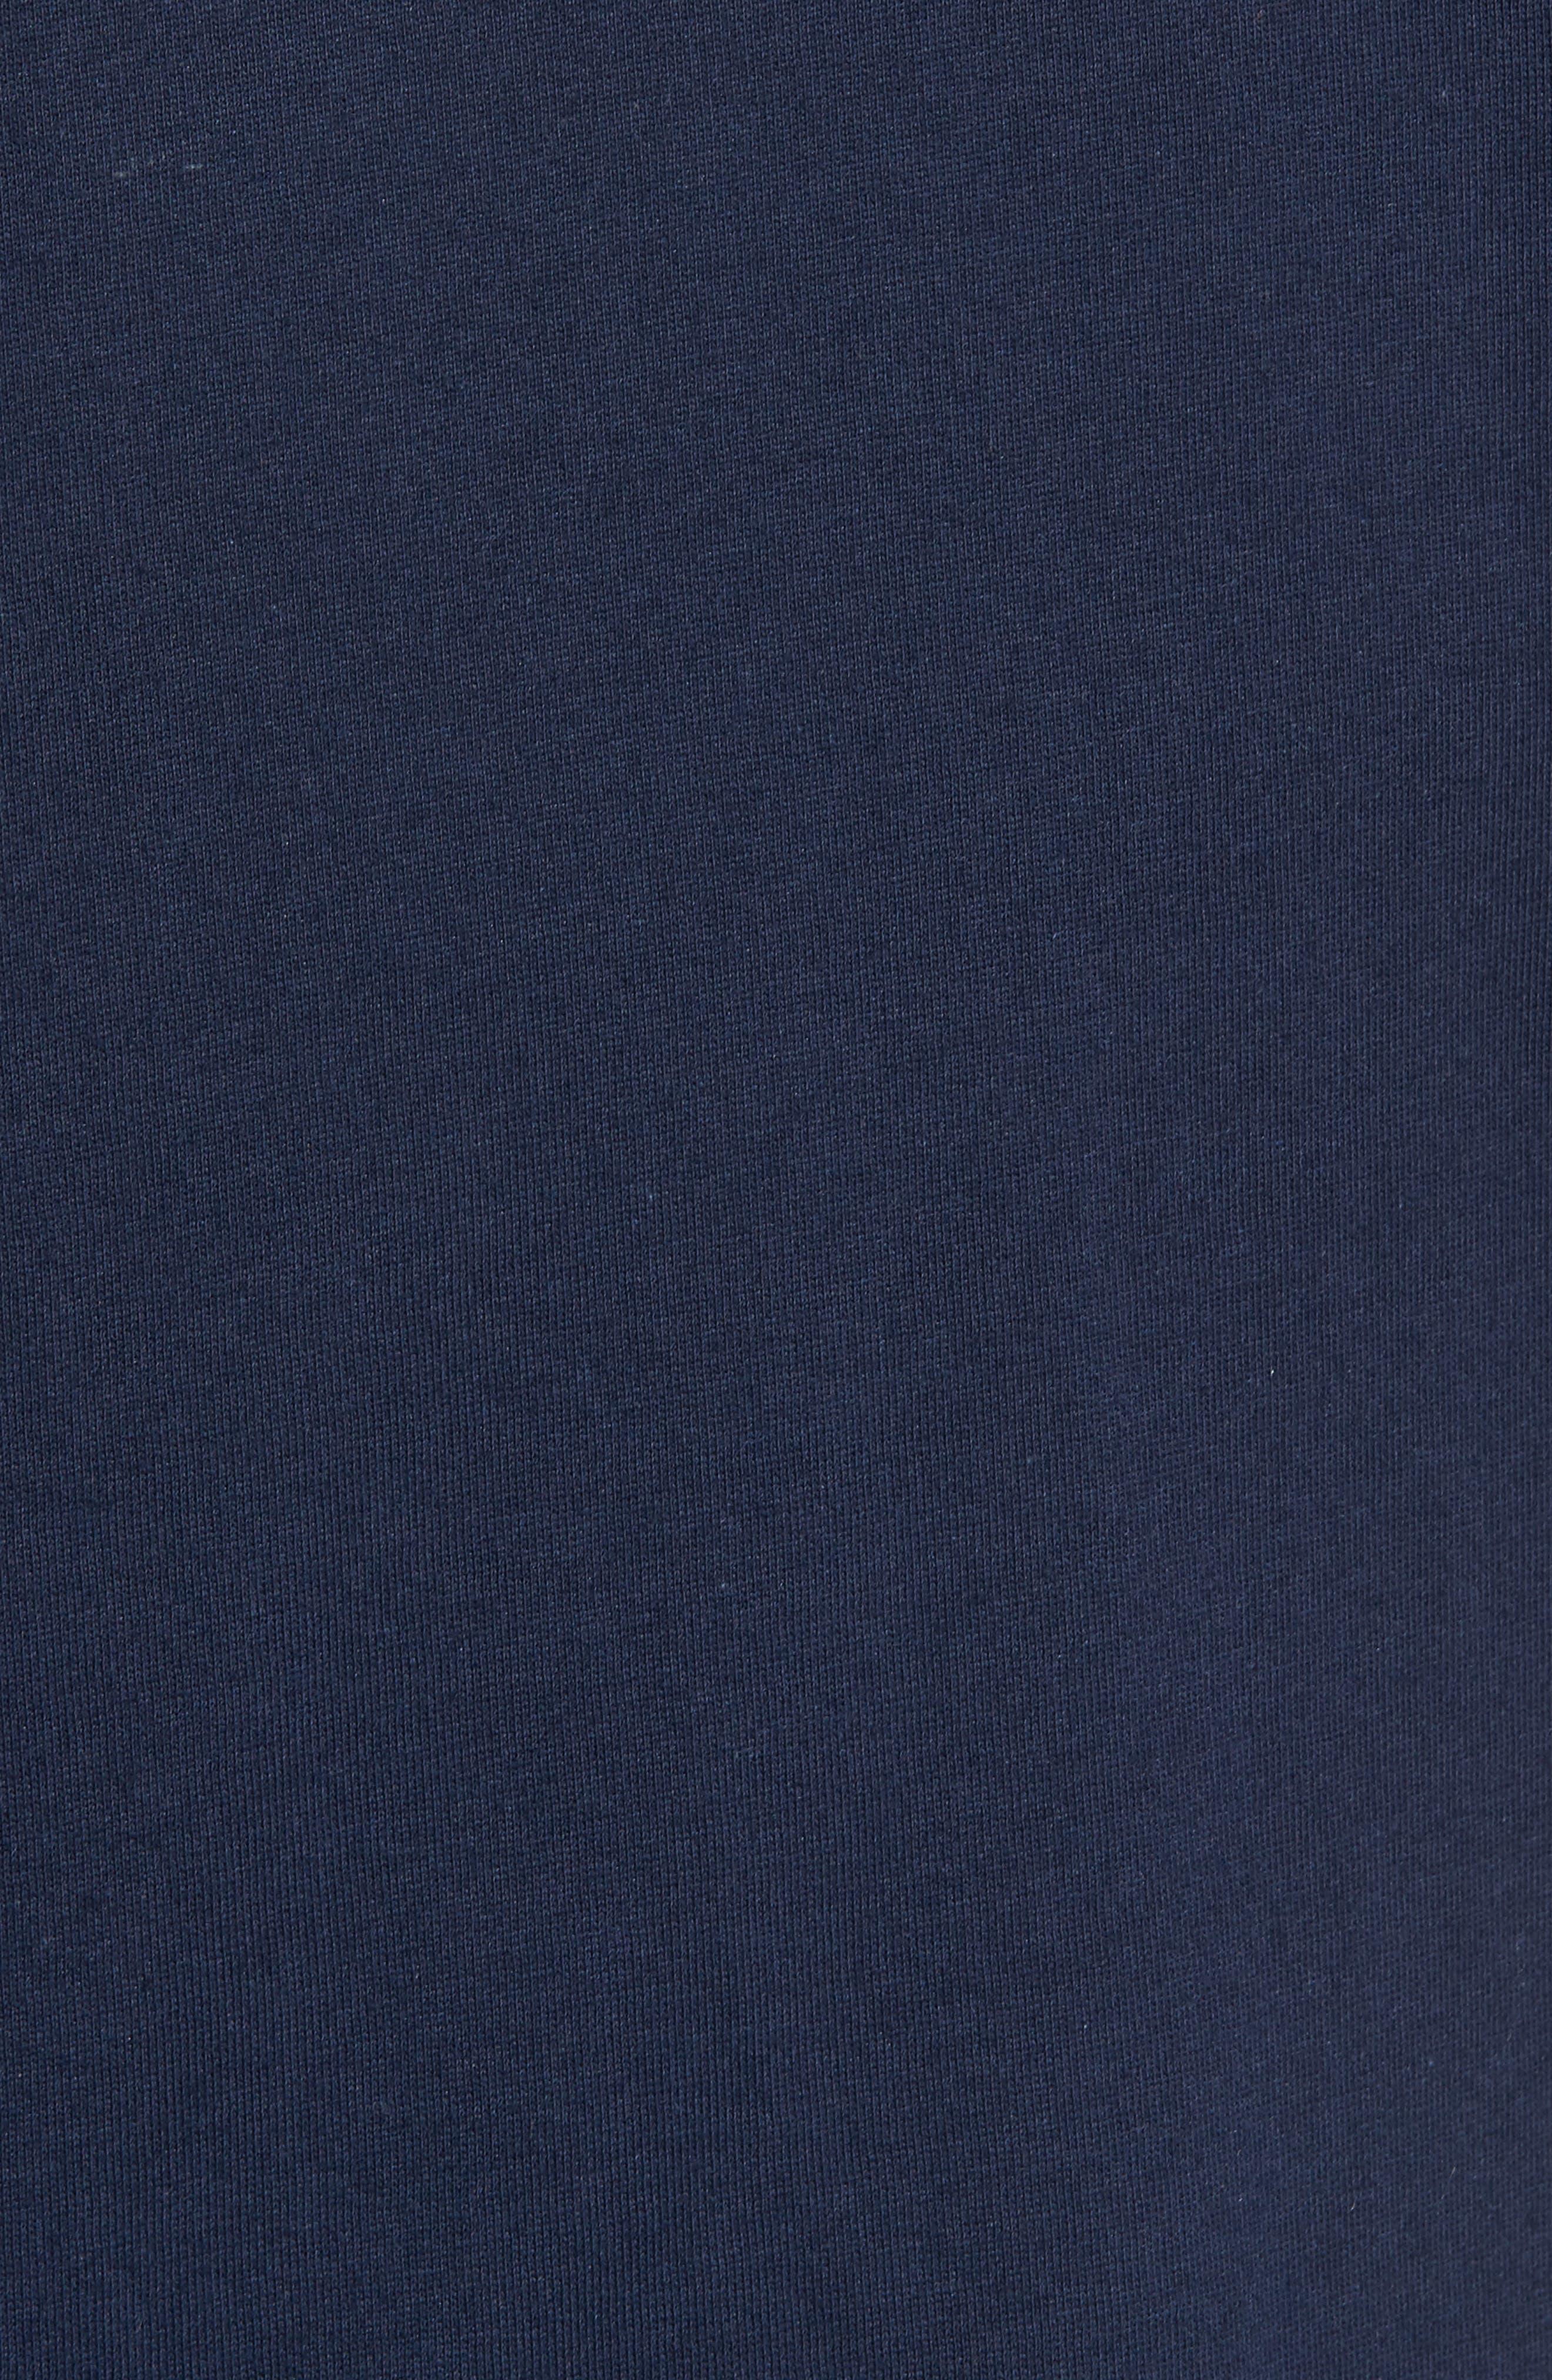 Nike 'SB Logo' T-Shirt,                             Alternate thumbnail 5, color,                             Obsidian/ Mineral Gold